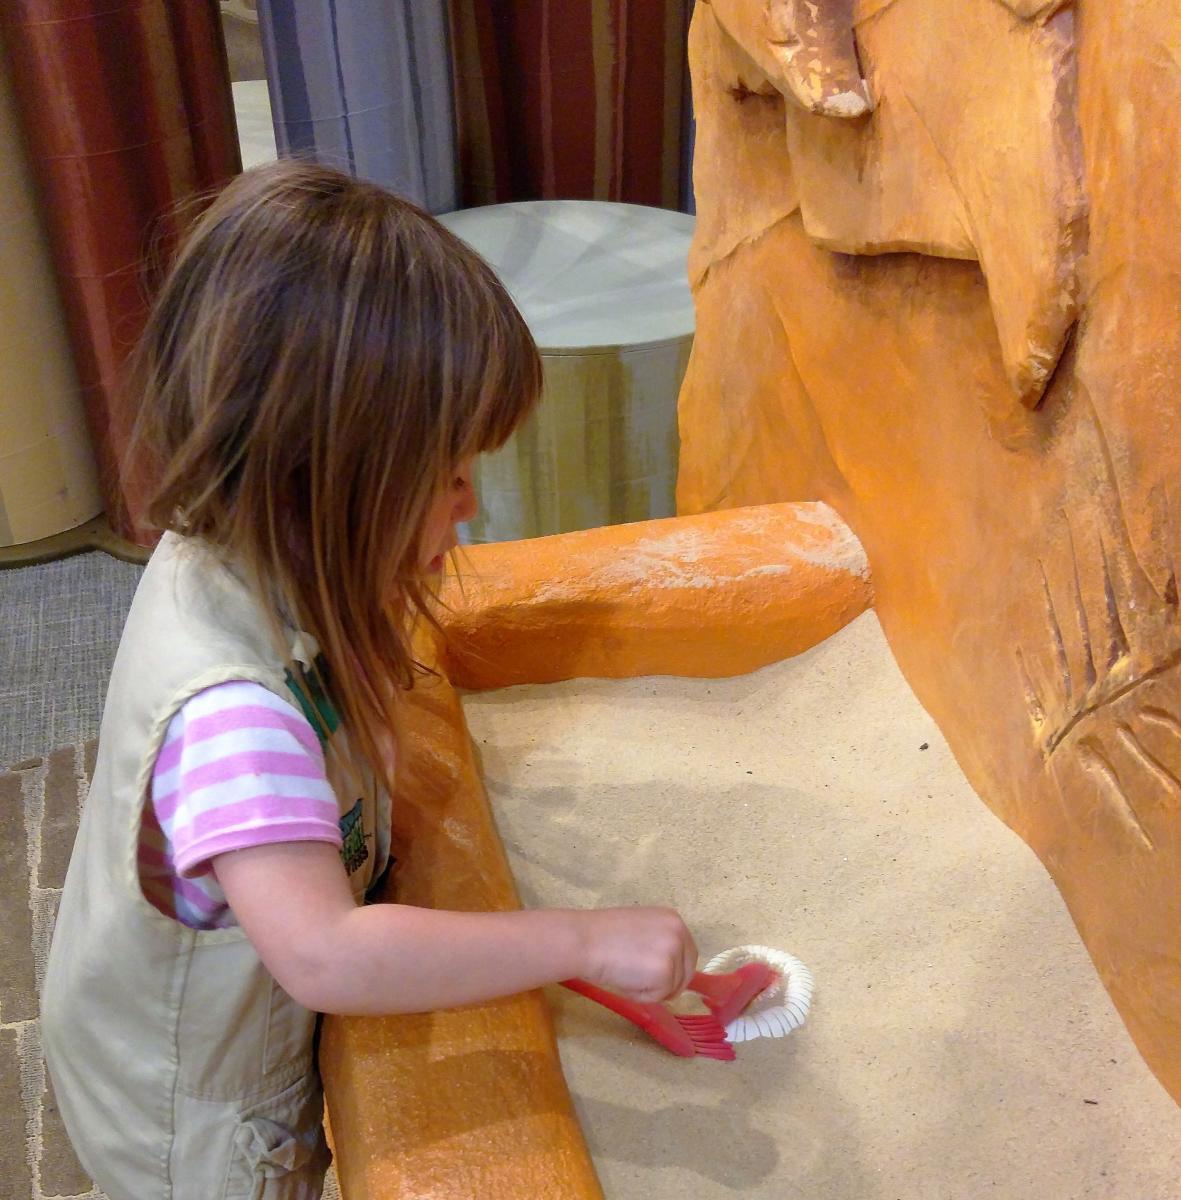 Big Dig at Bucks County Children's Museum